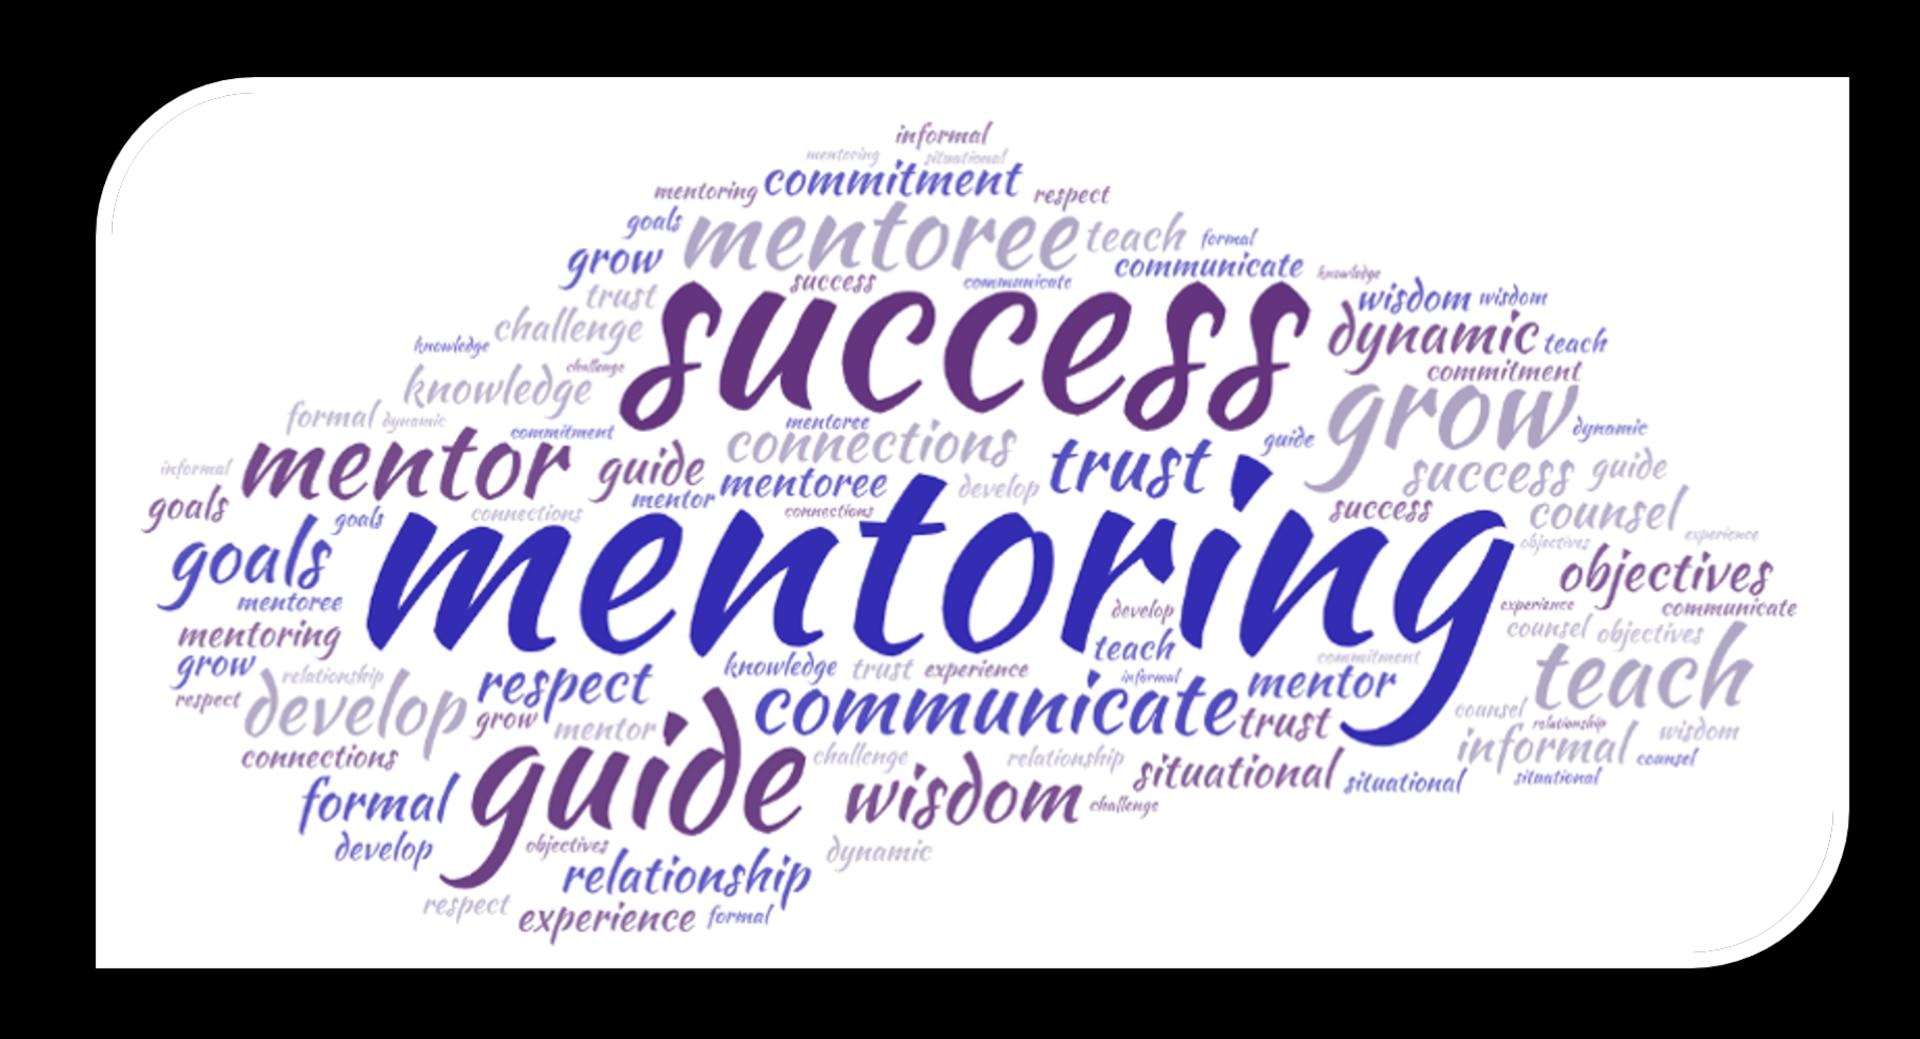 wordcloud of mentoring terms